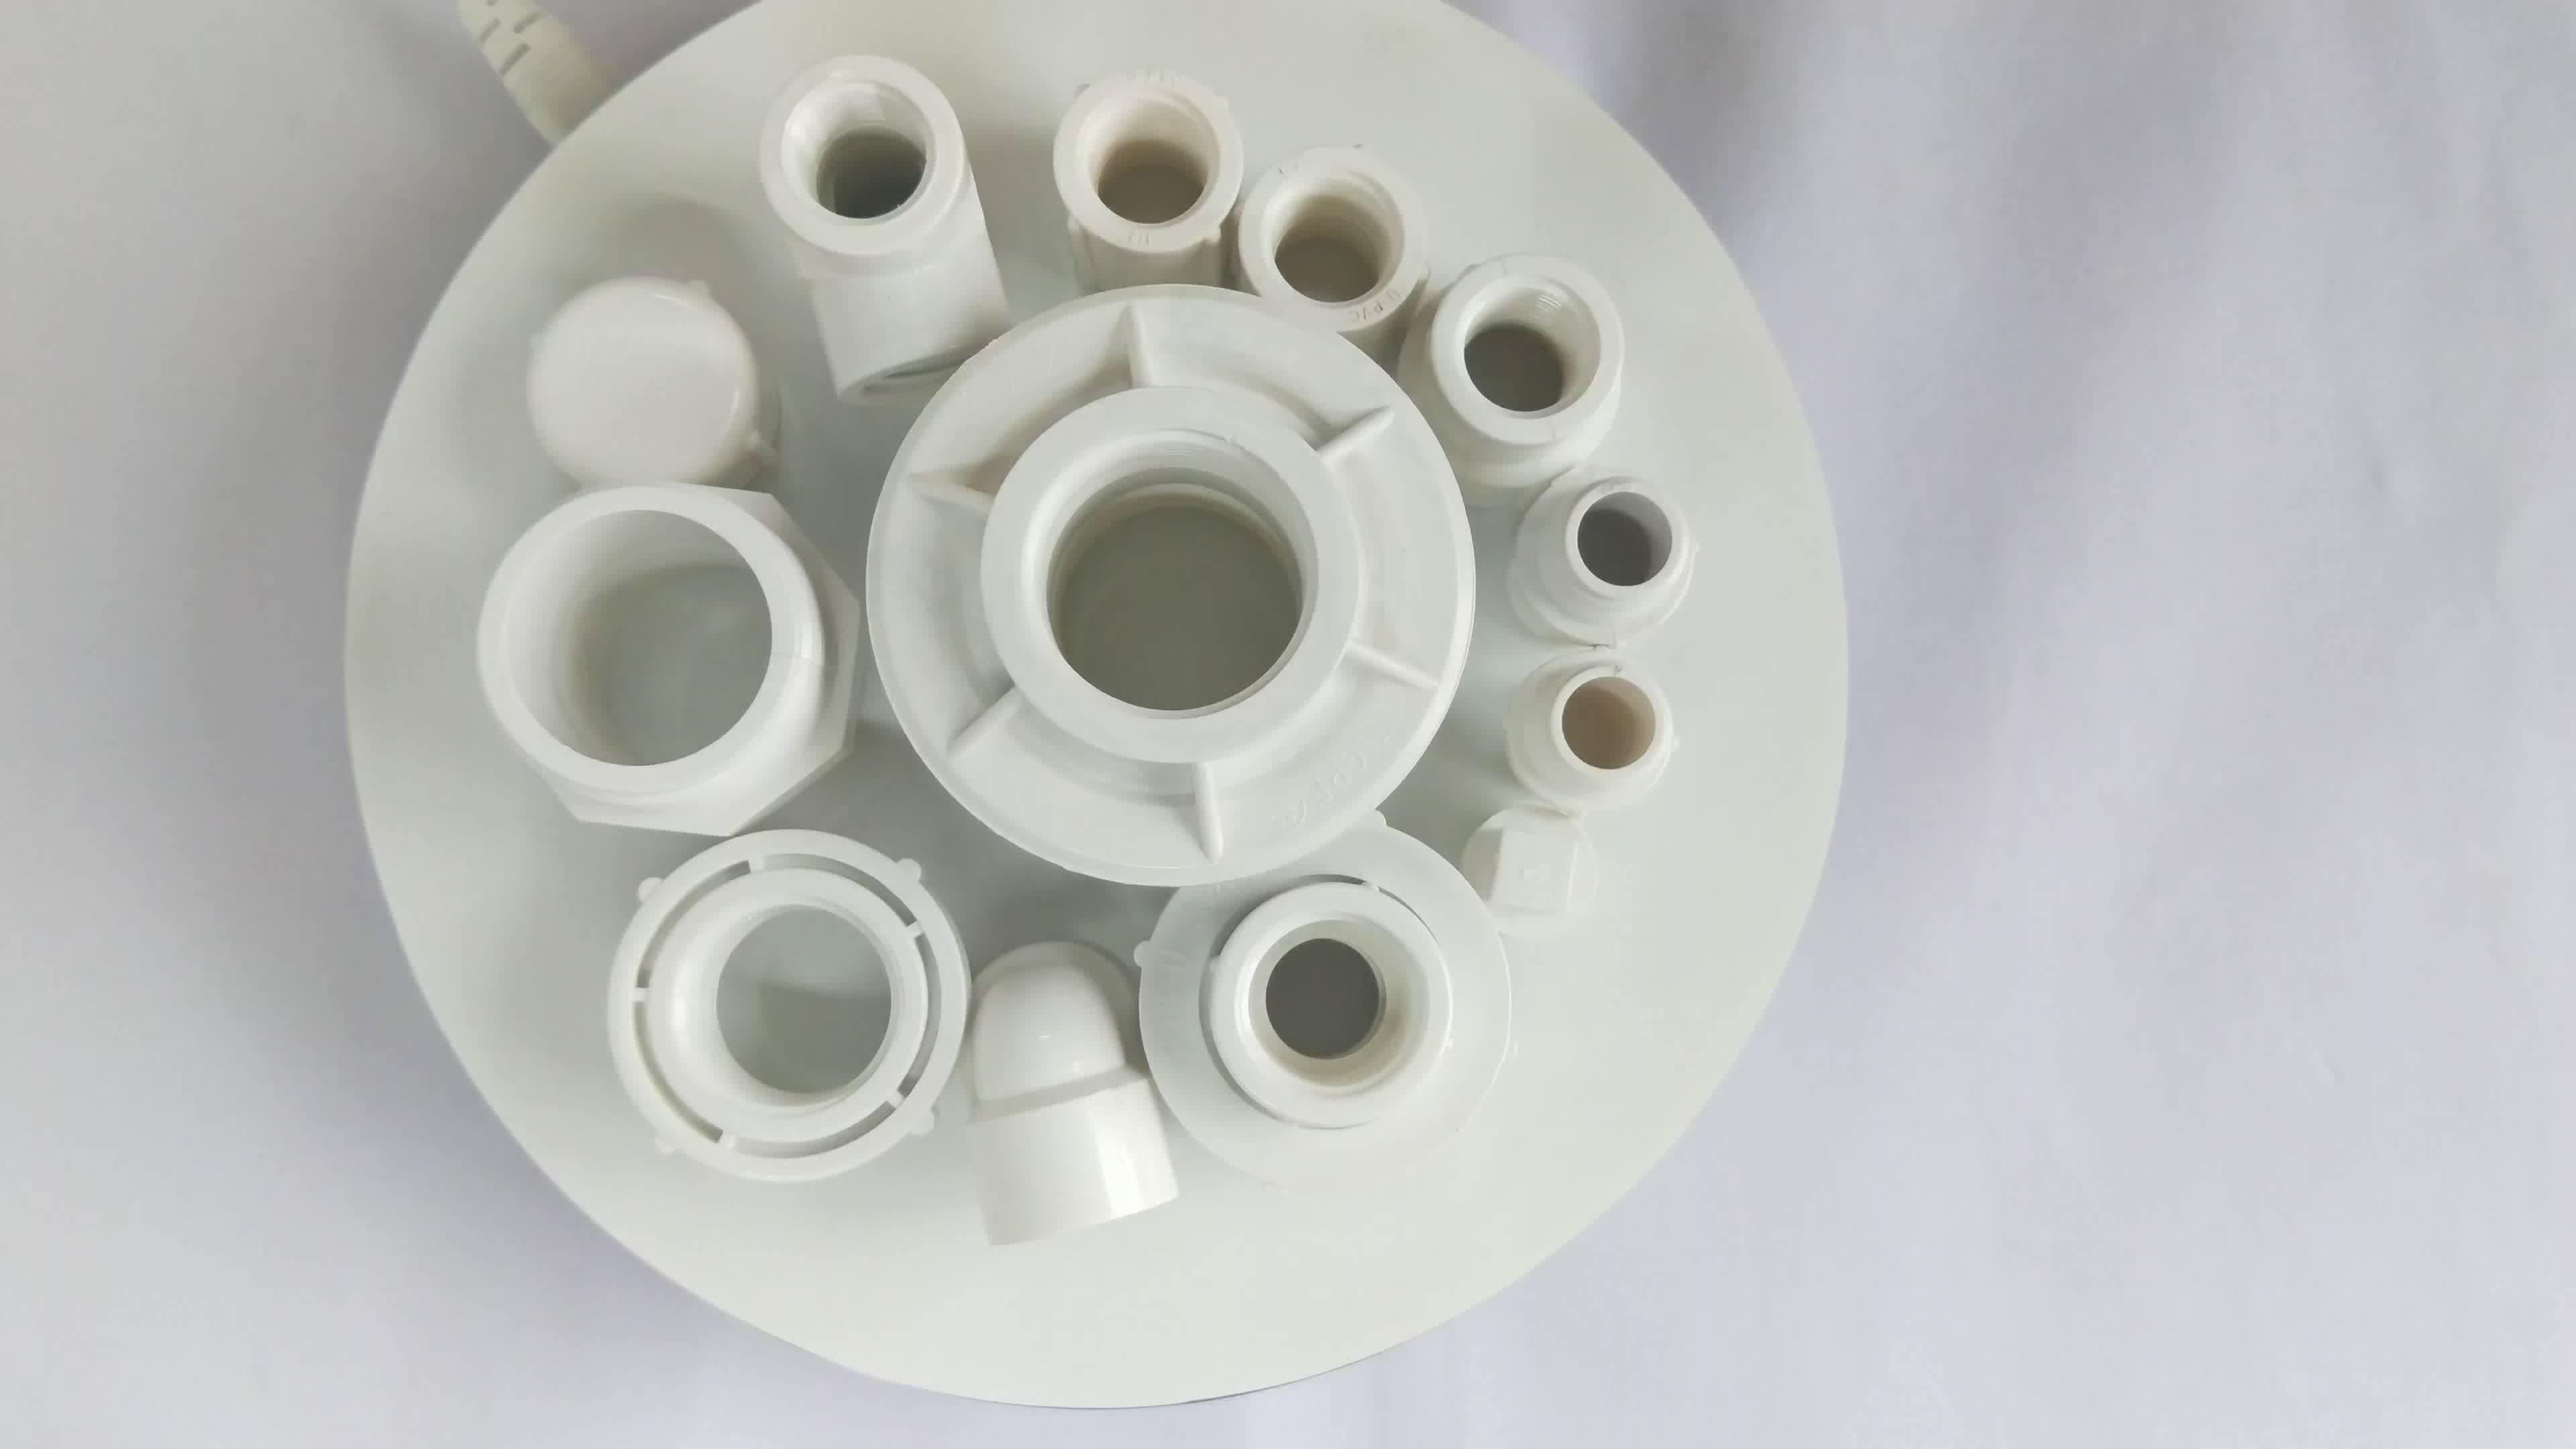 PVC Tekanan Fitting PVC Pipa Fitting untuk Air Plastik Tabung Konektor